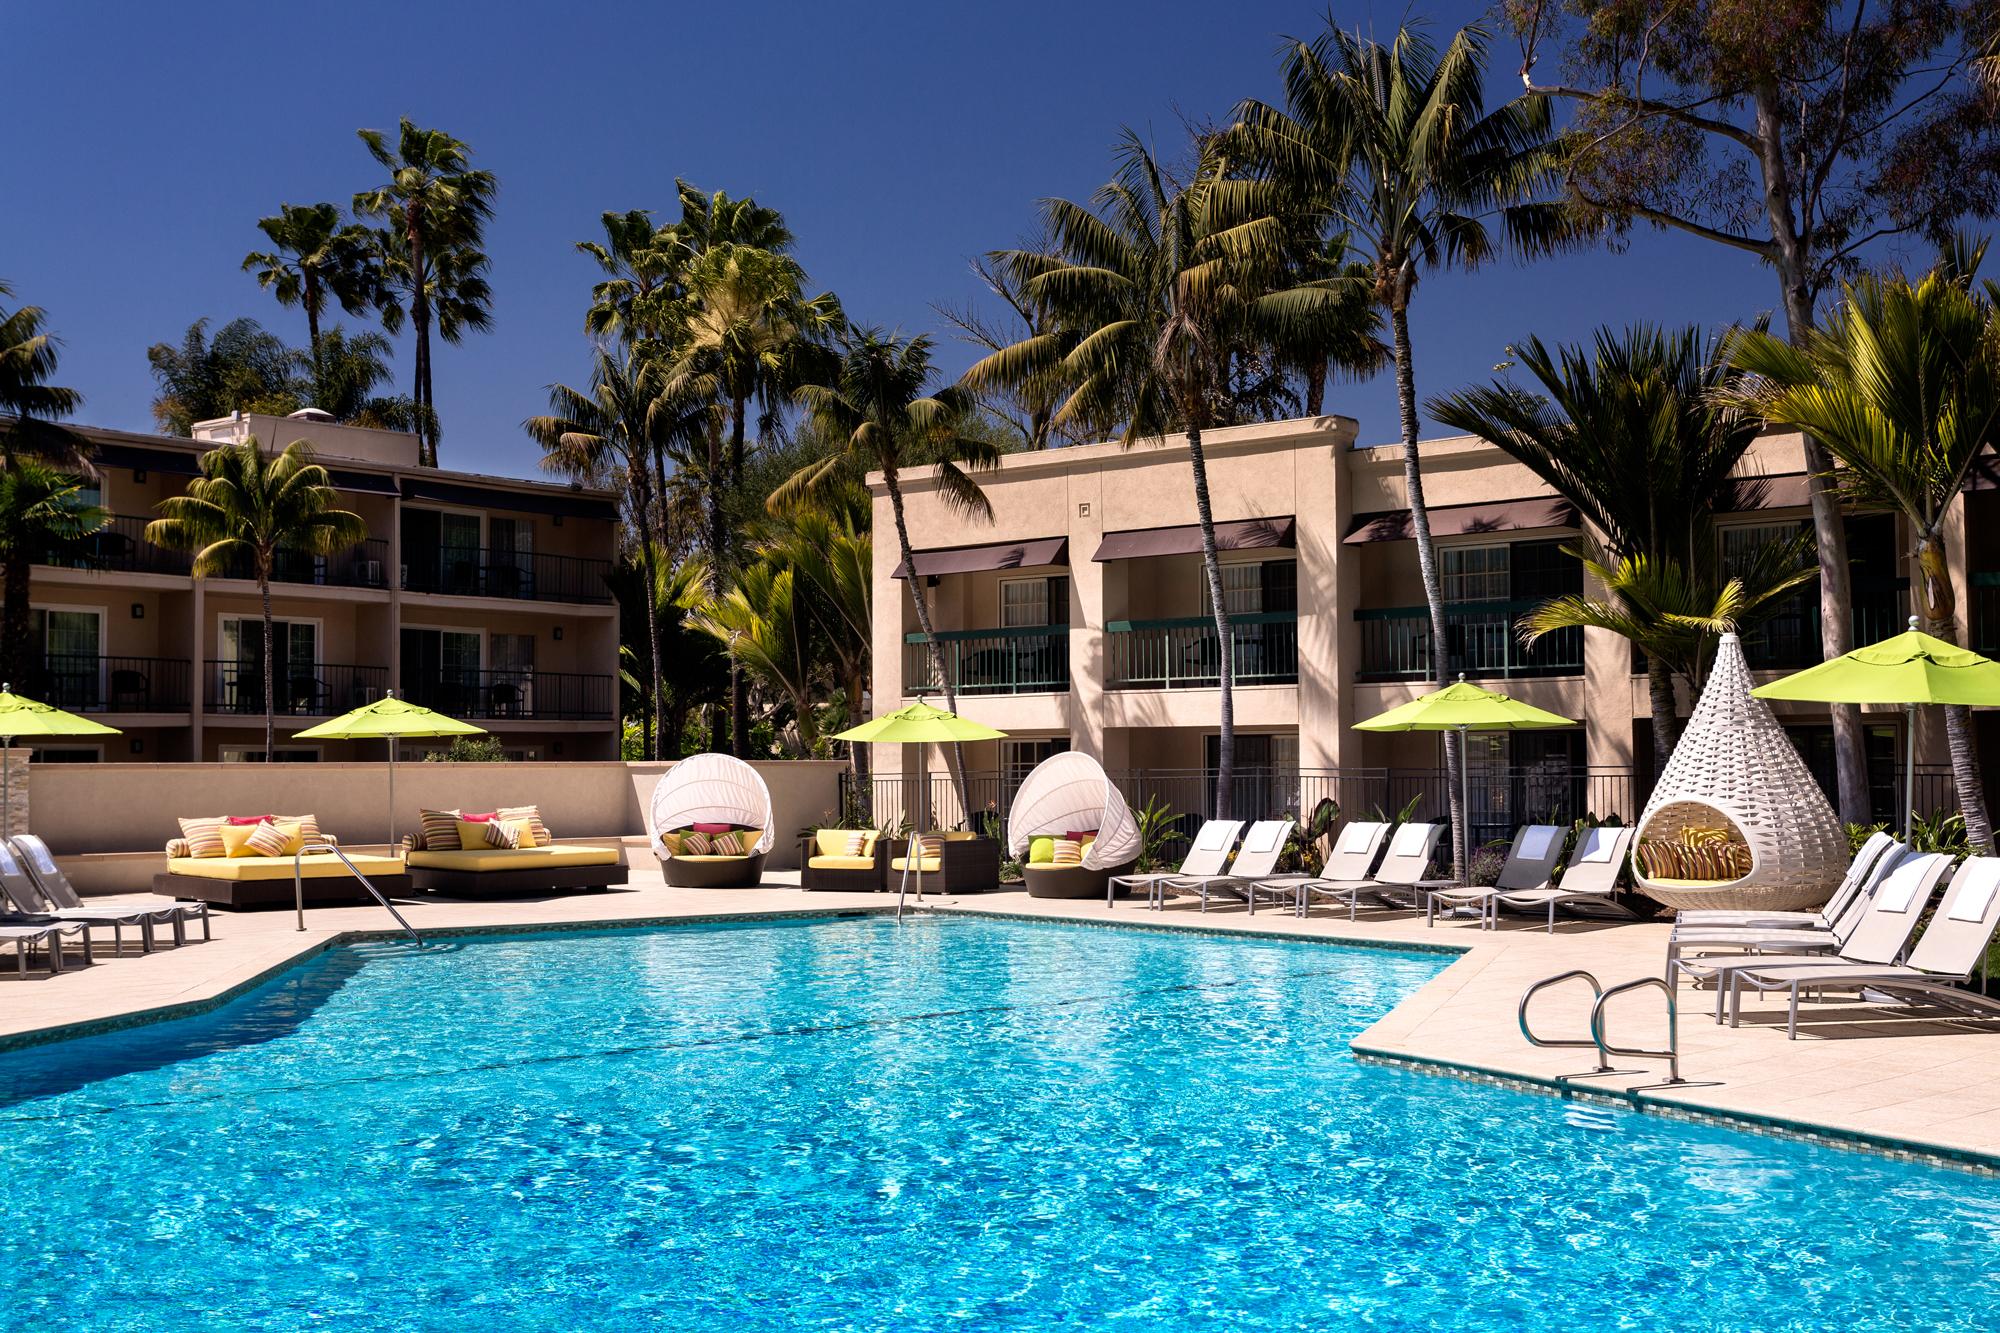 Poolside Dining Visit Newport Beach